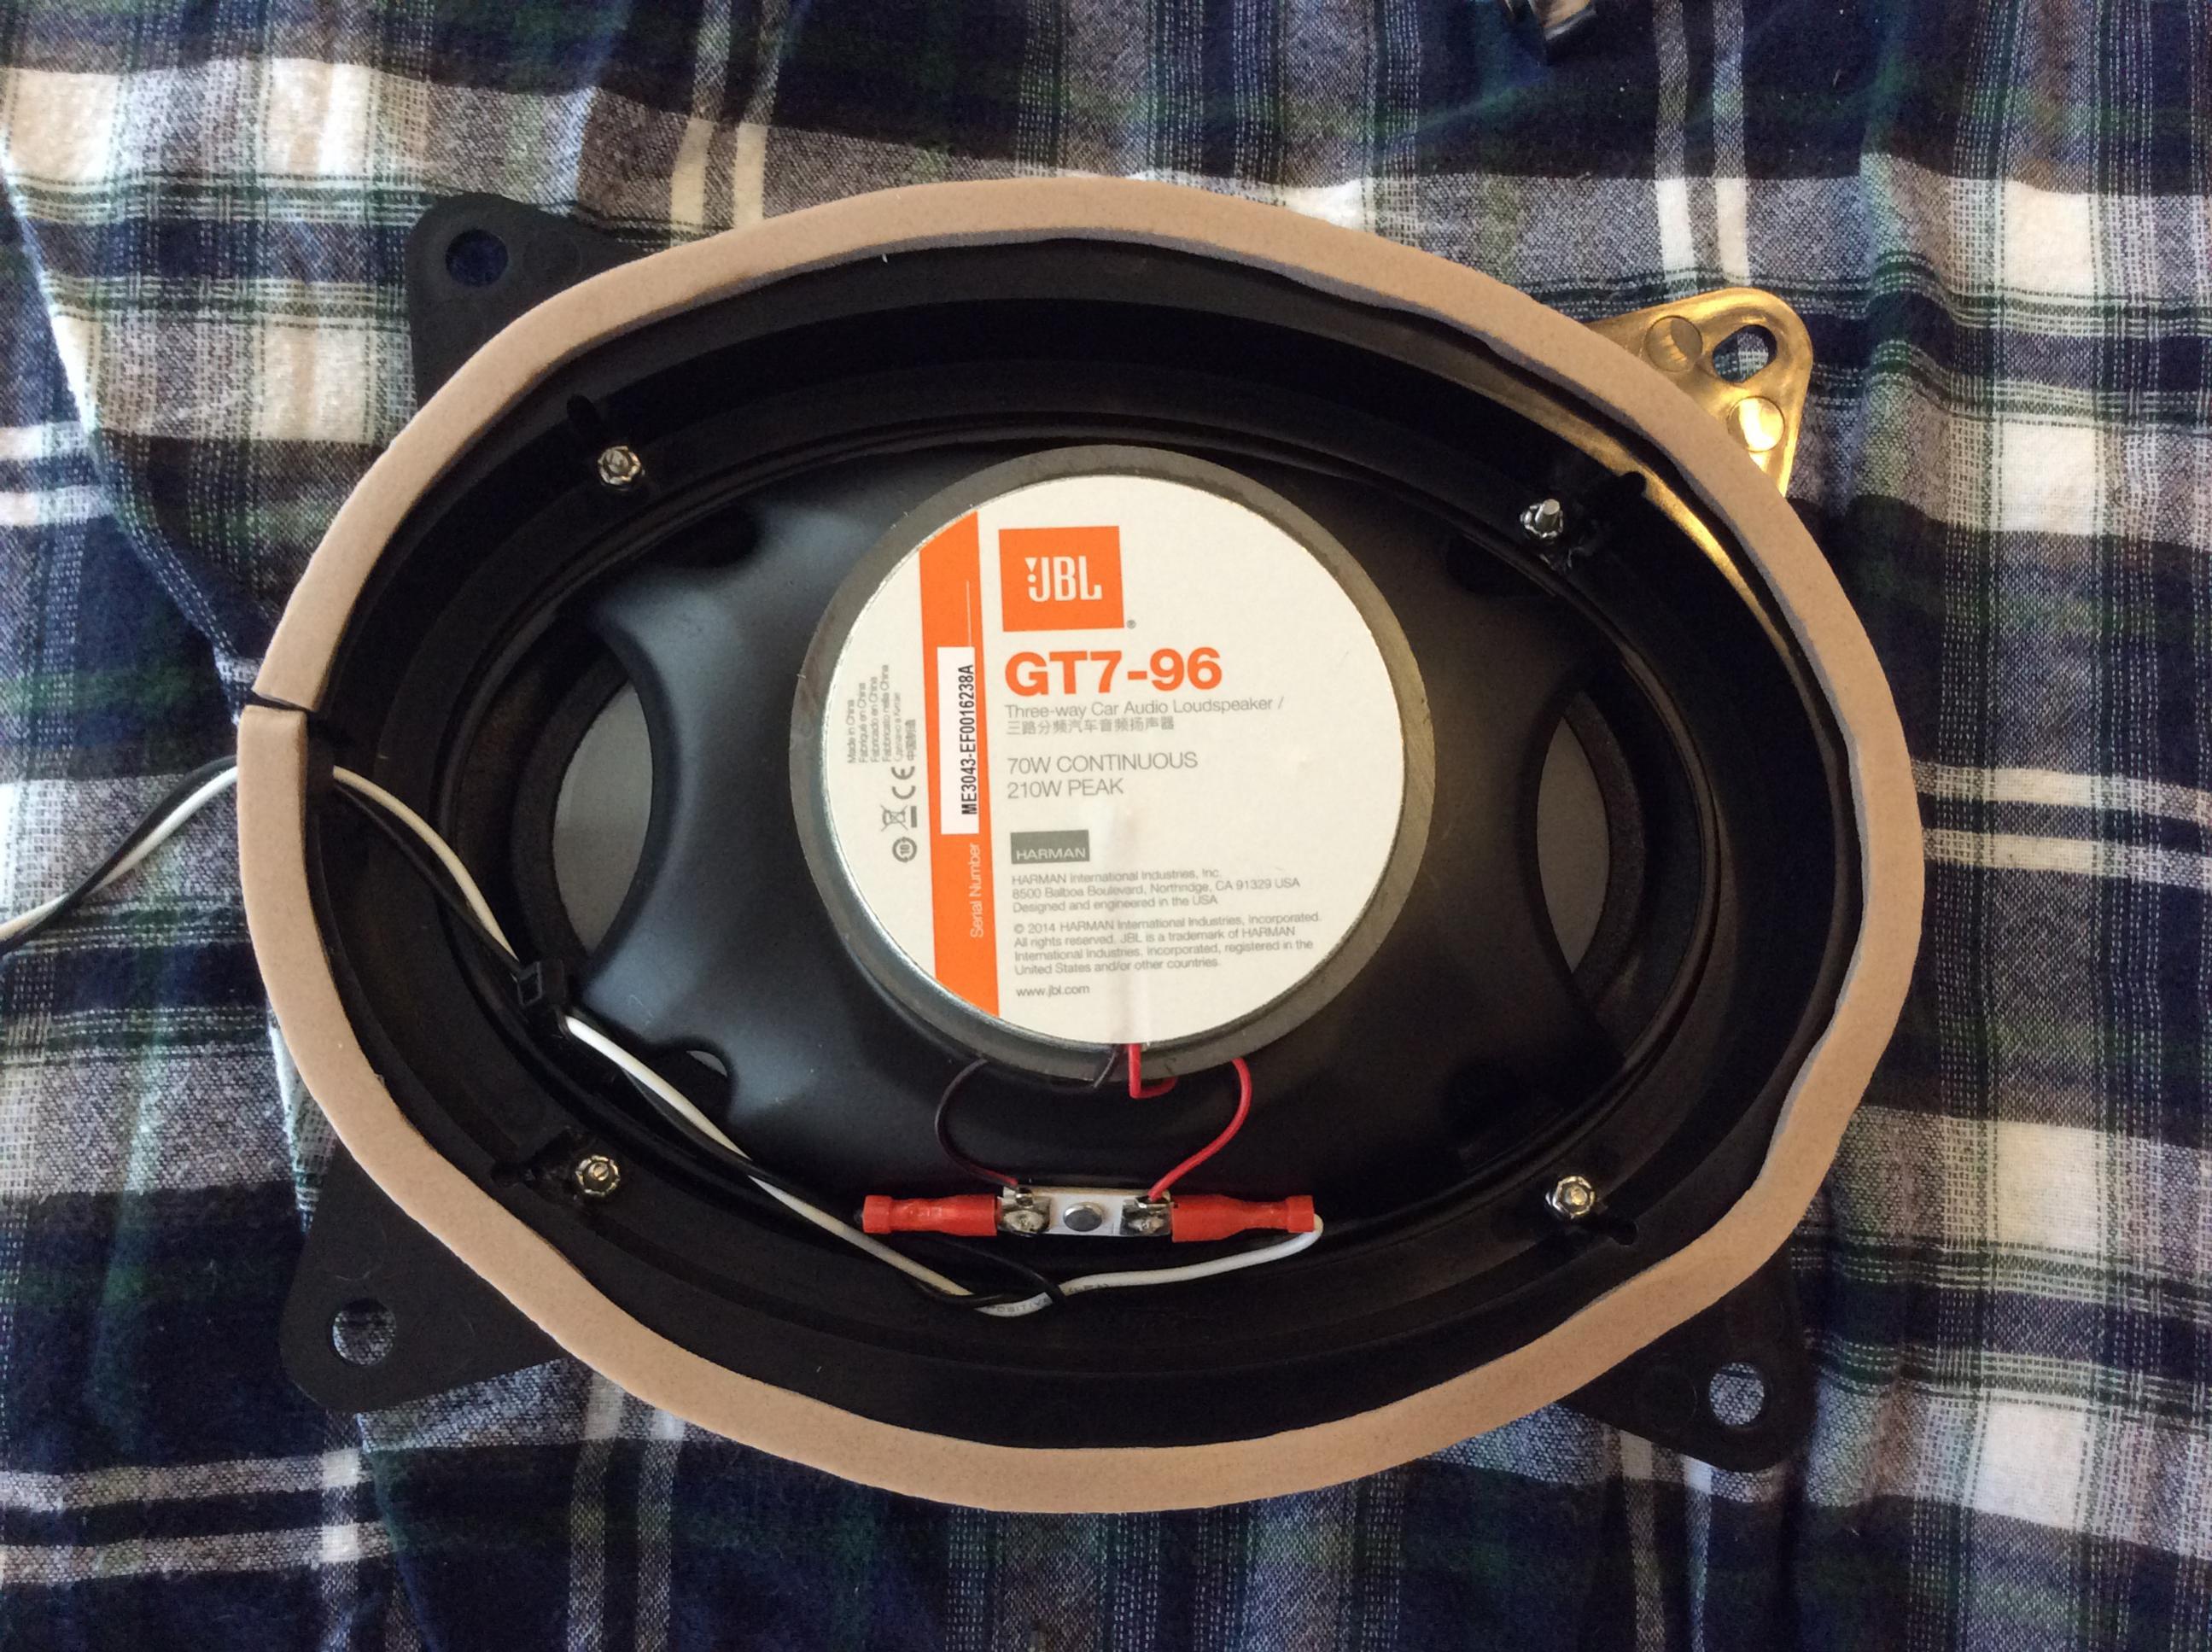 100+ Toyota Camry Jbl Sound System – yasminroohi